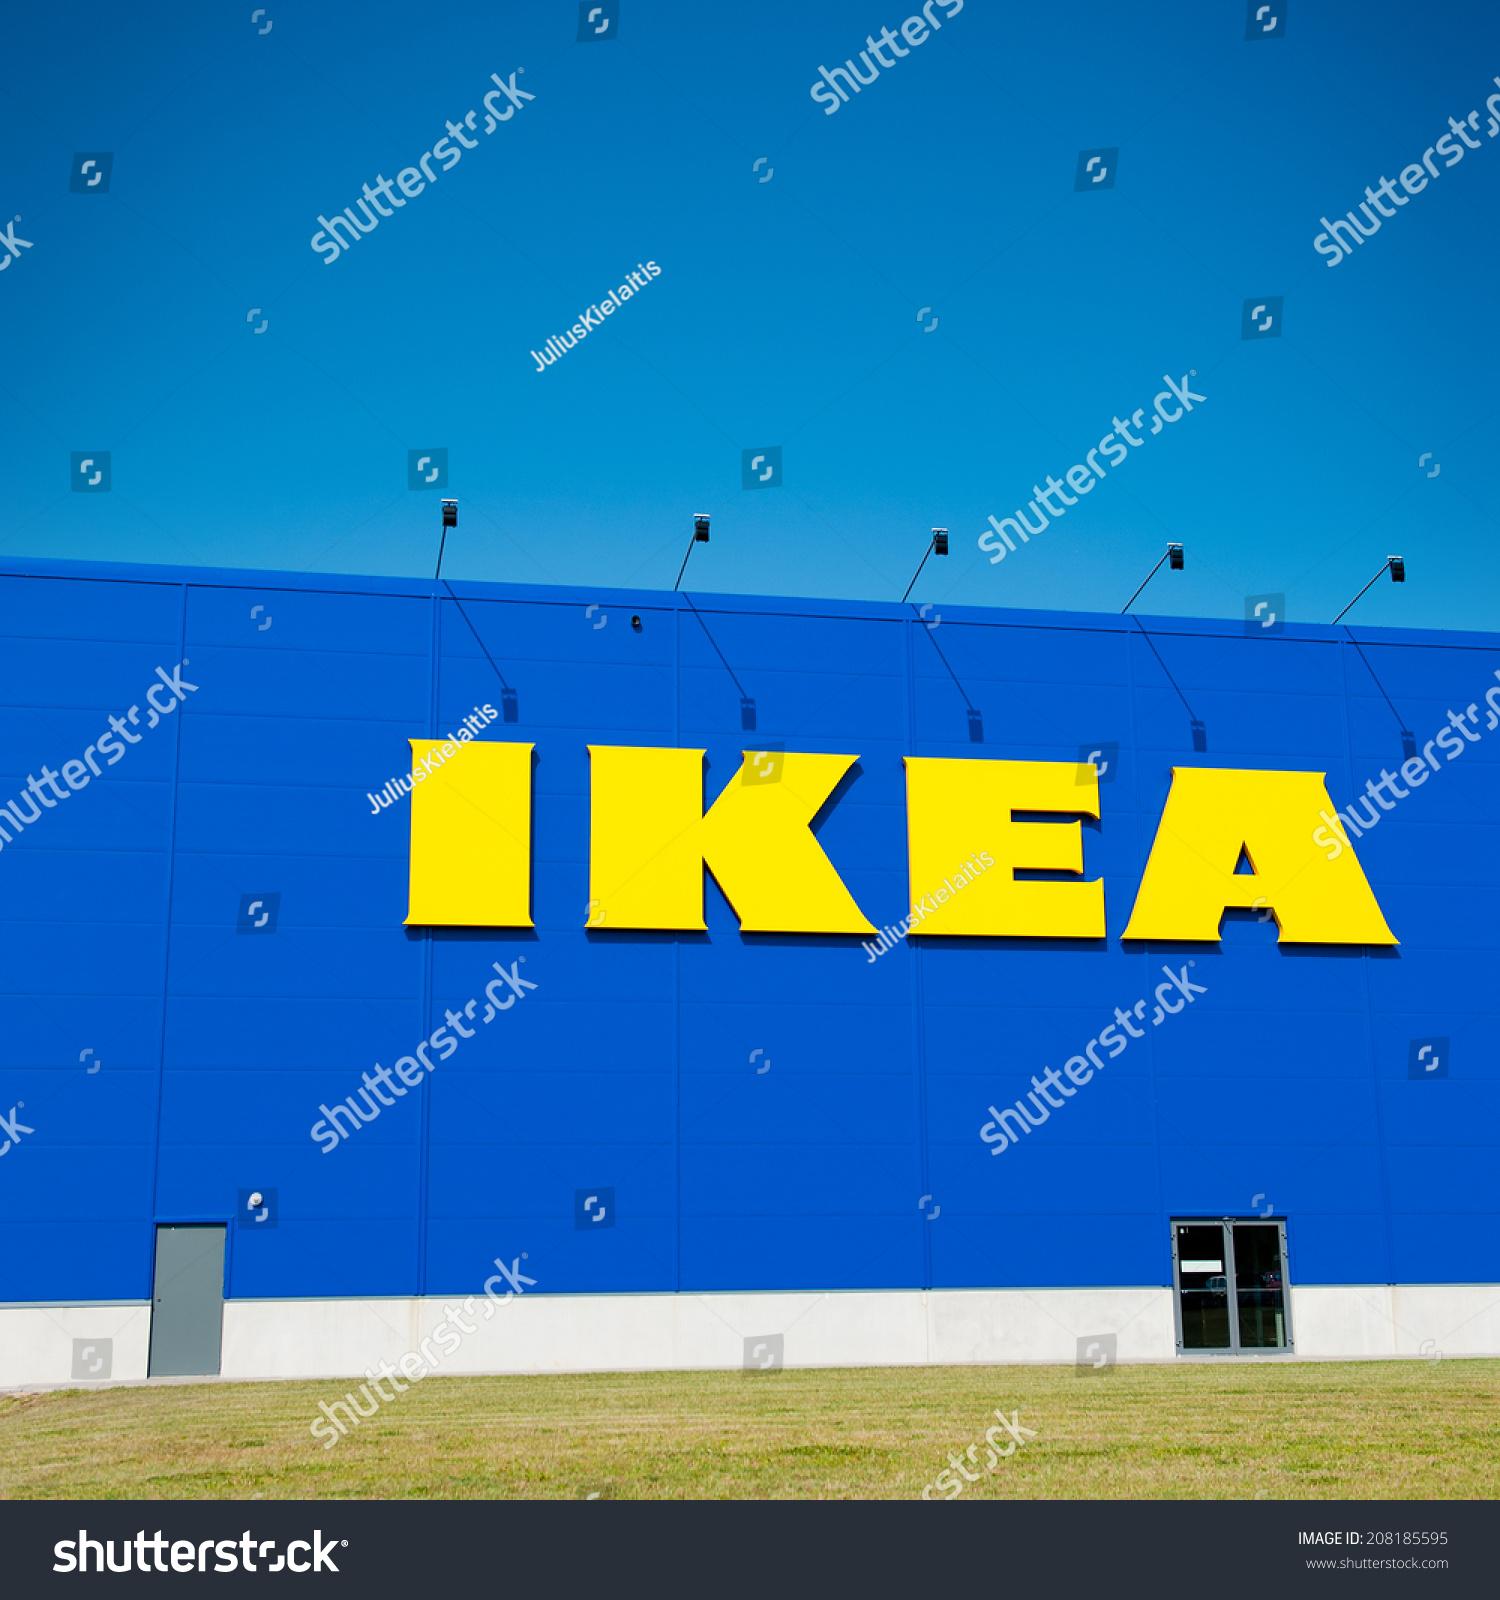 Ikea Showroom Related Keywords: July 25: Ikea Store On July 25, 2014